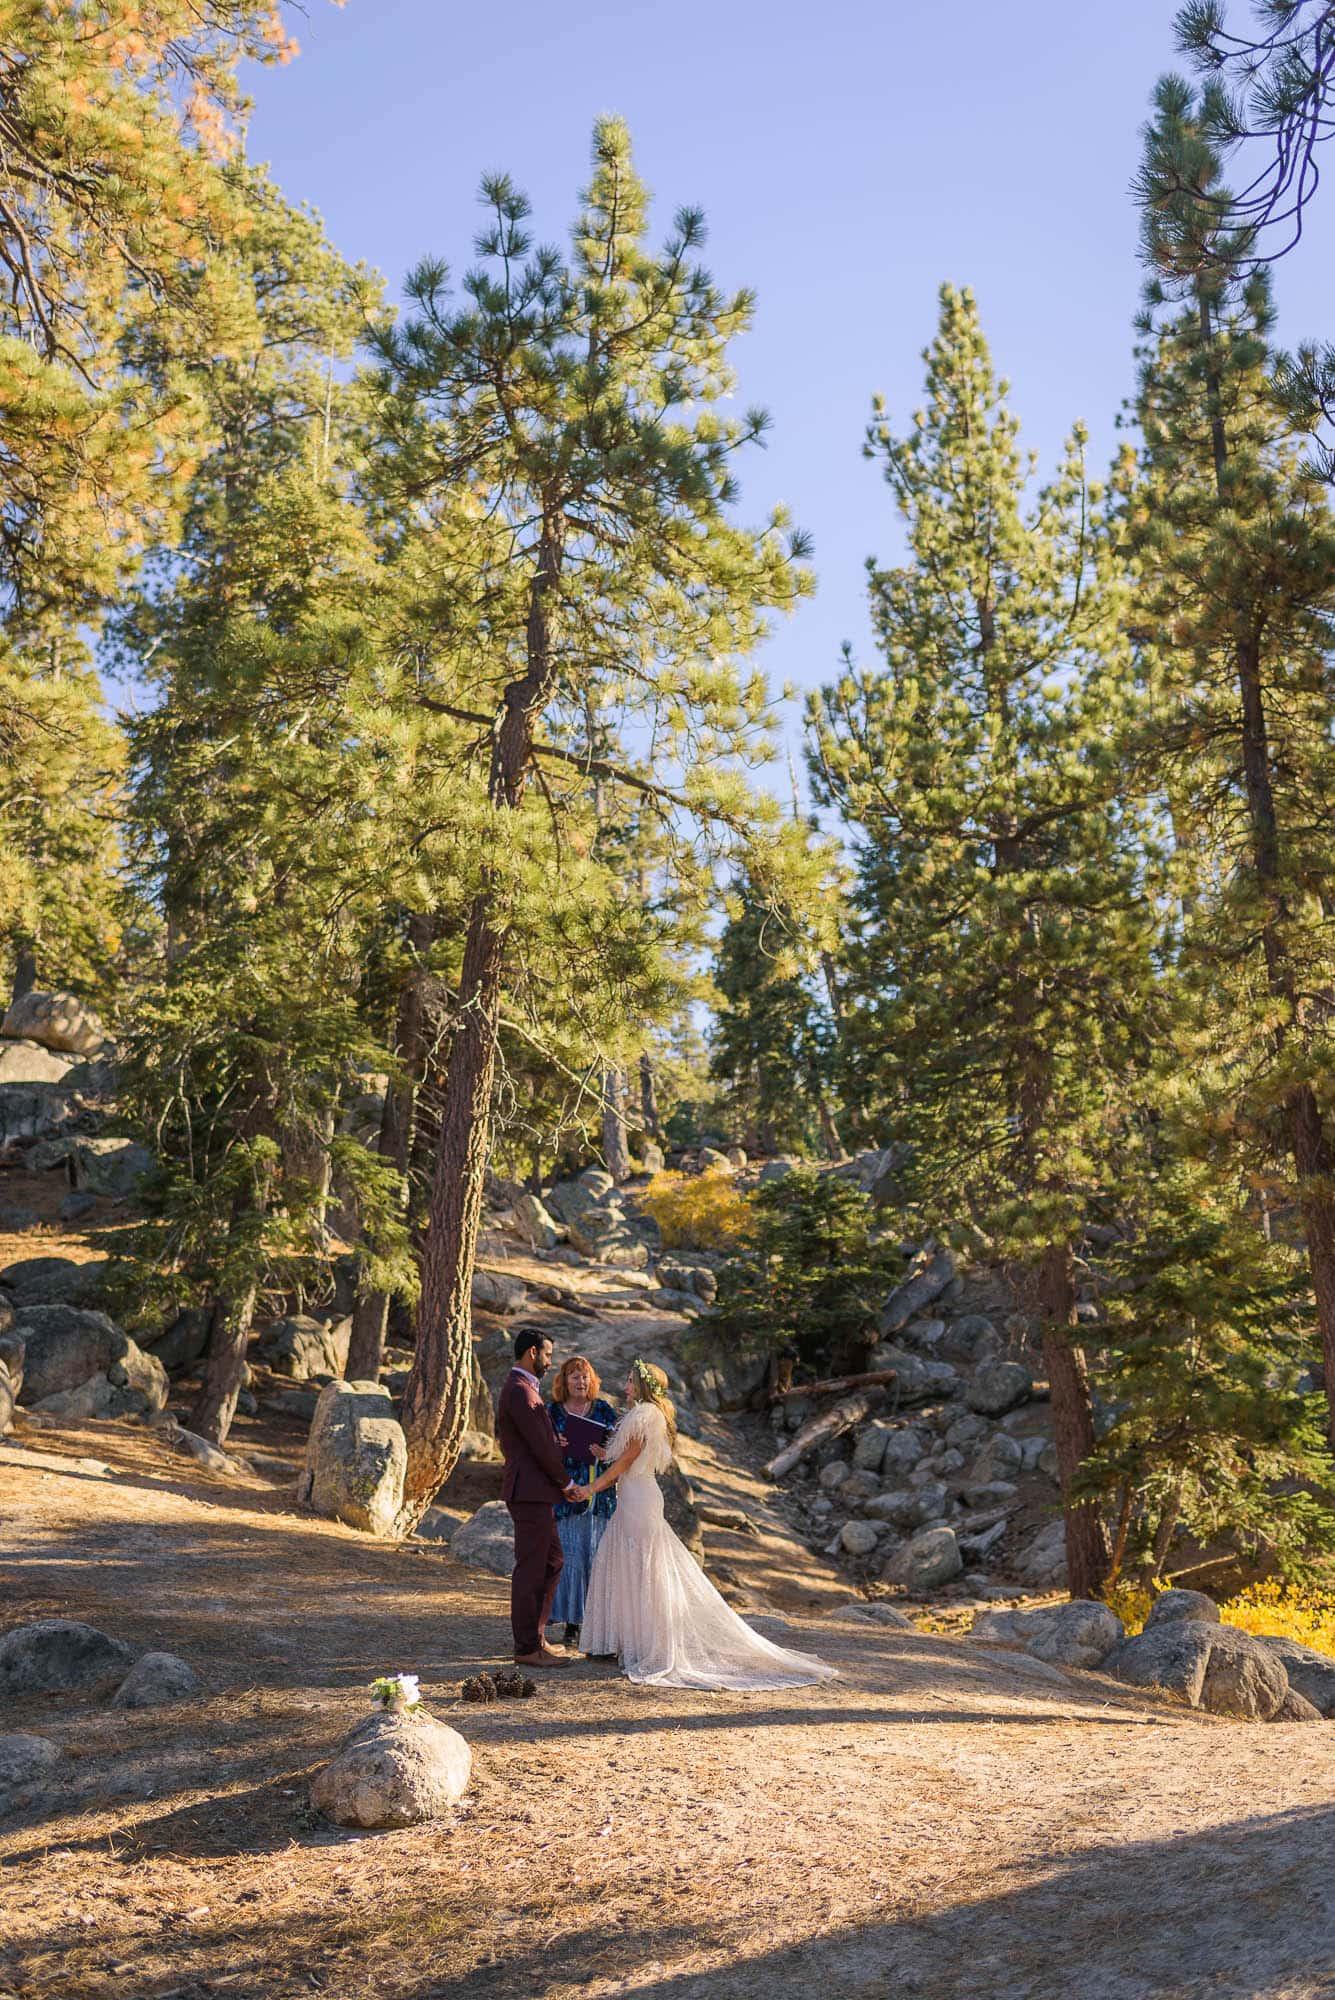 018_Alan_and_Heidi_Wedding_Natalie_Mike